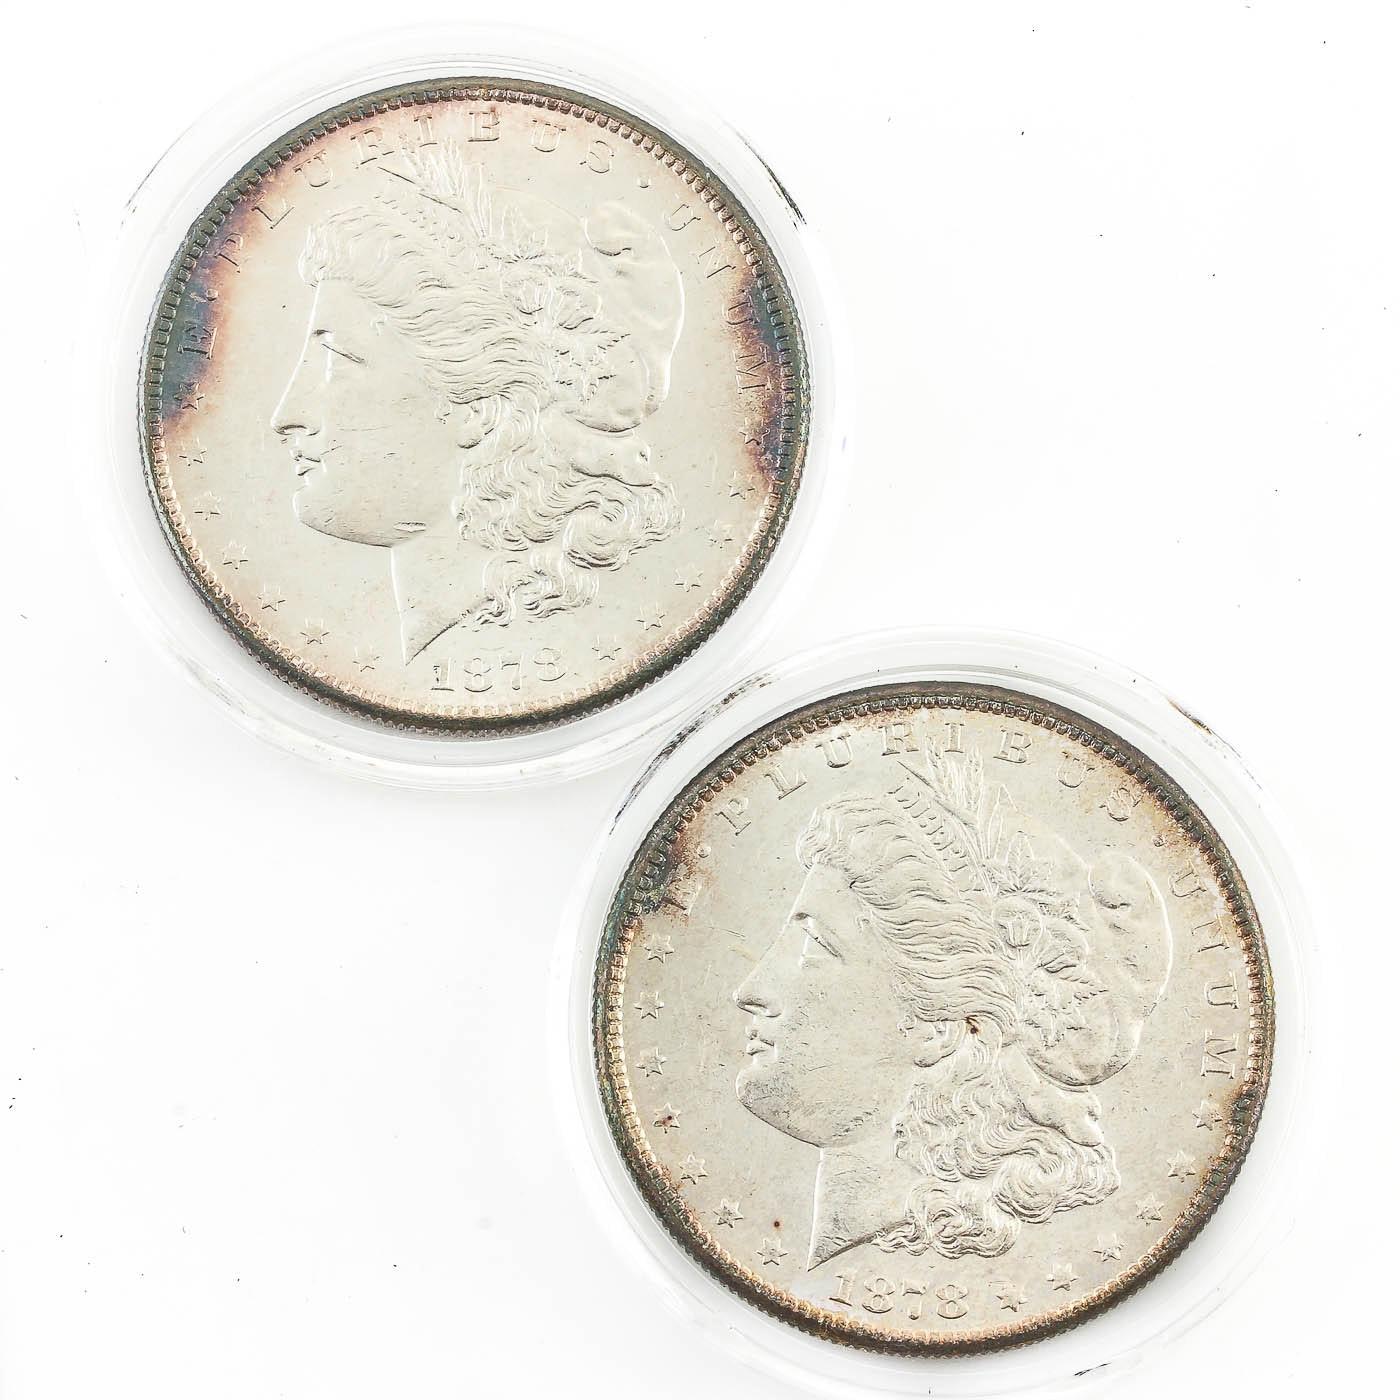 Two 1878-S Morgan Silver Dollars